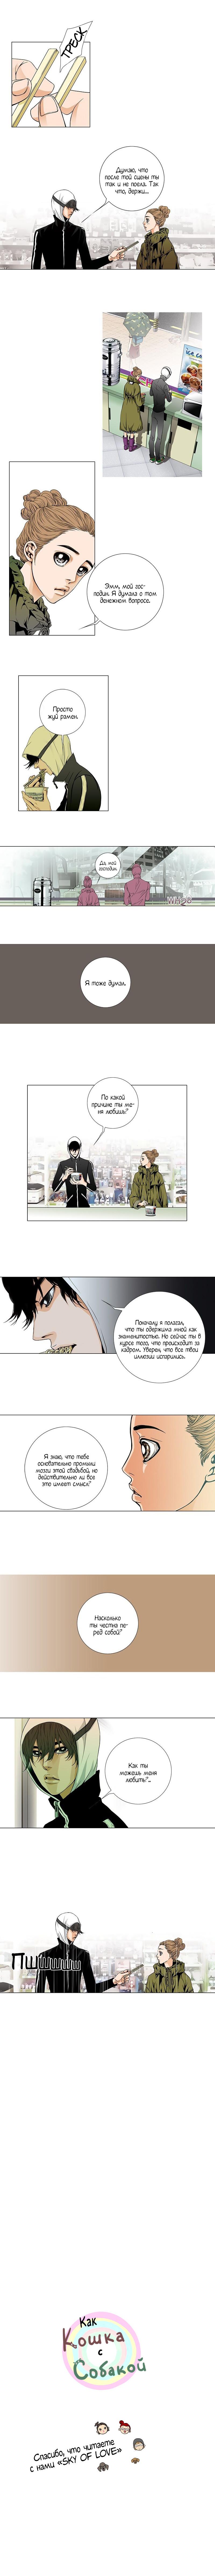 https://r1.ninemanga.com/comics/pic2/29/28573/344301/1512077671384.jpg Page 5